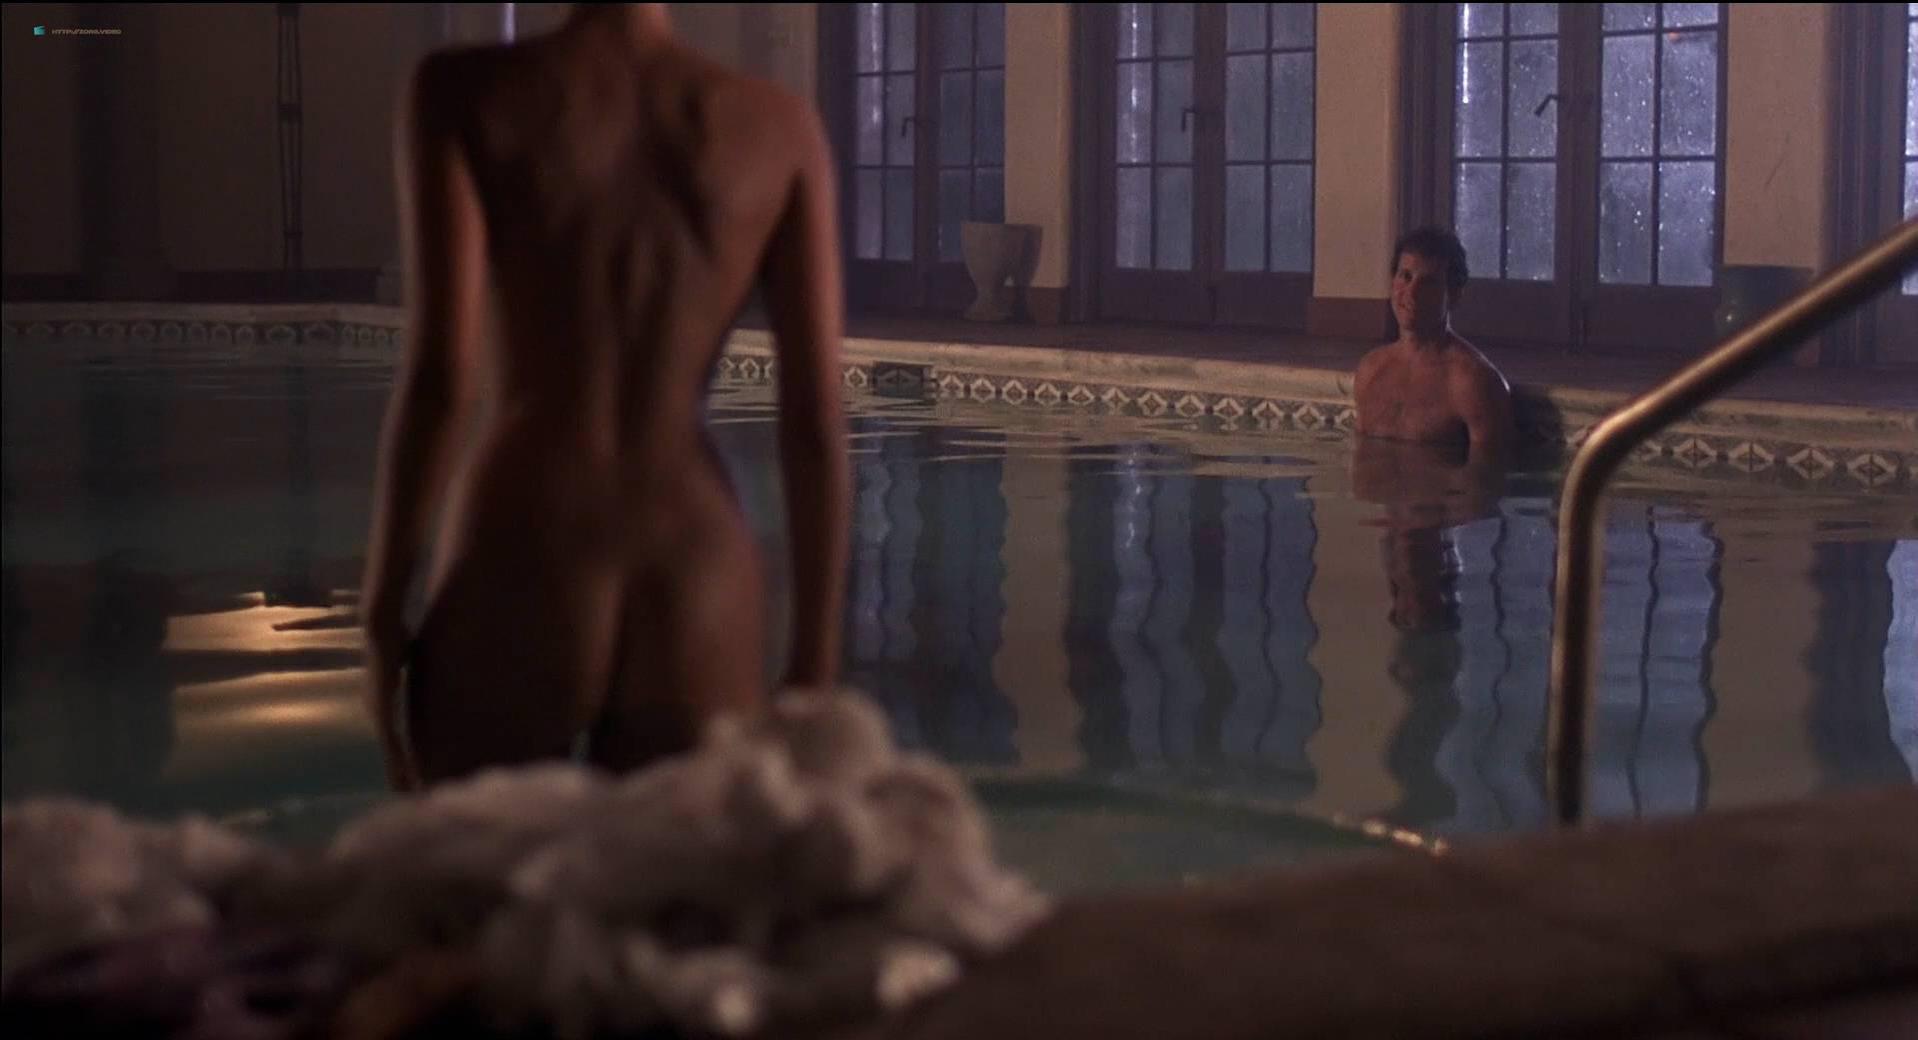 Tahnee Welch nude - Cocoon (1985)